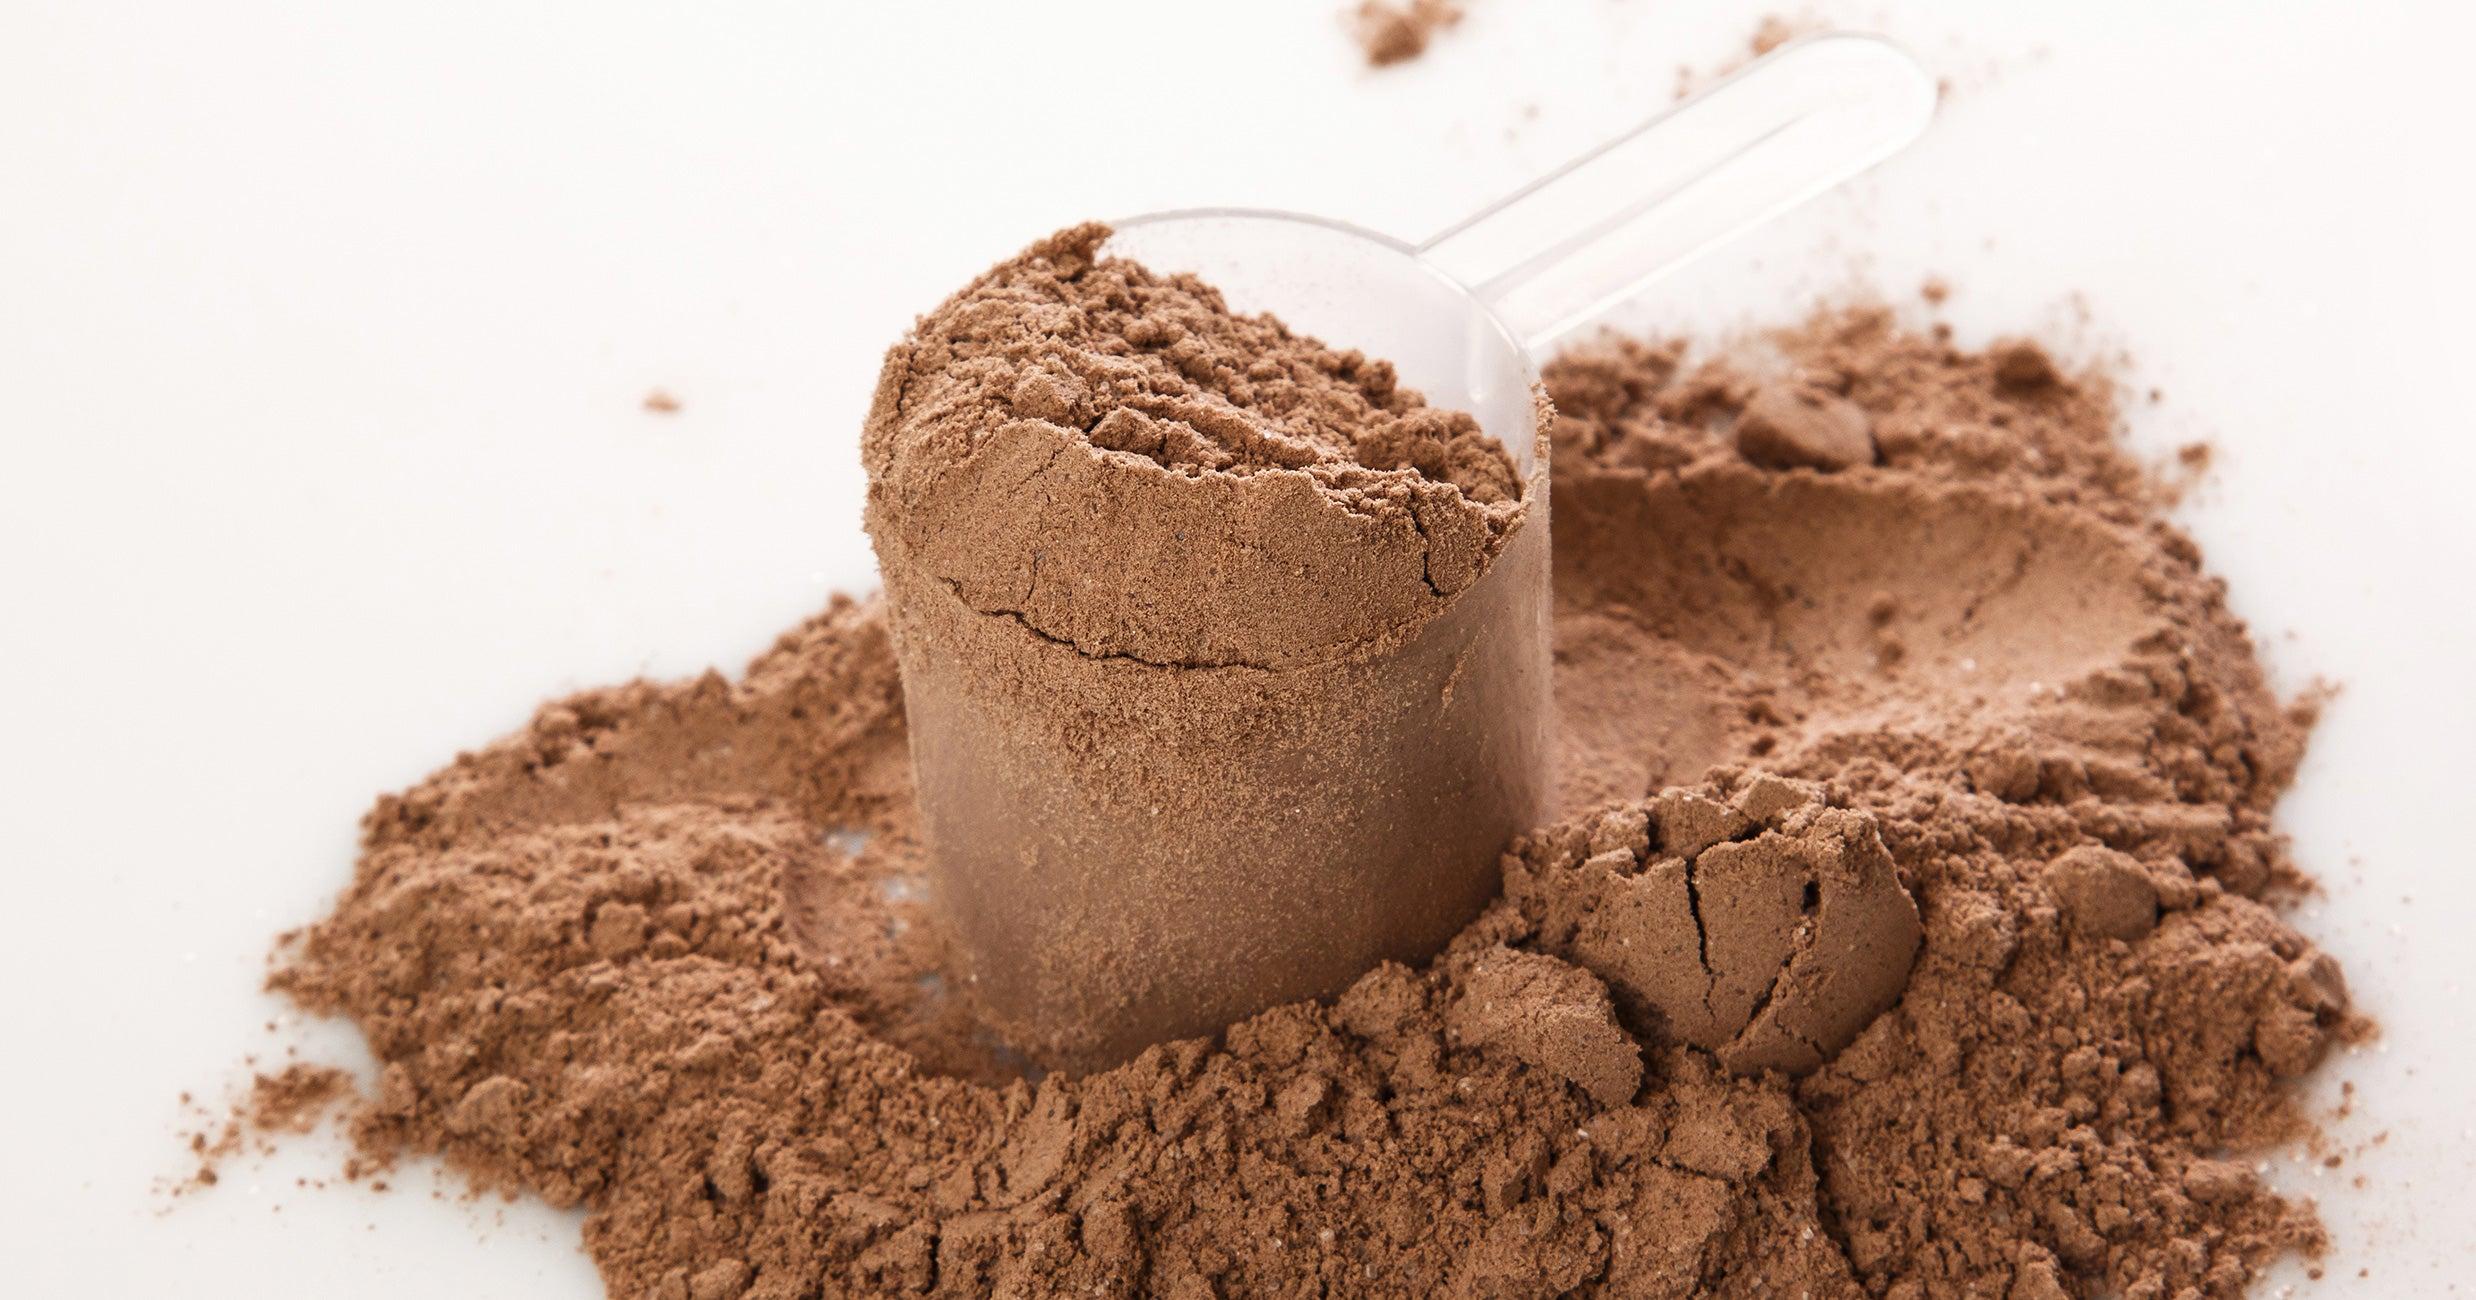 A scoop of brown powder